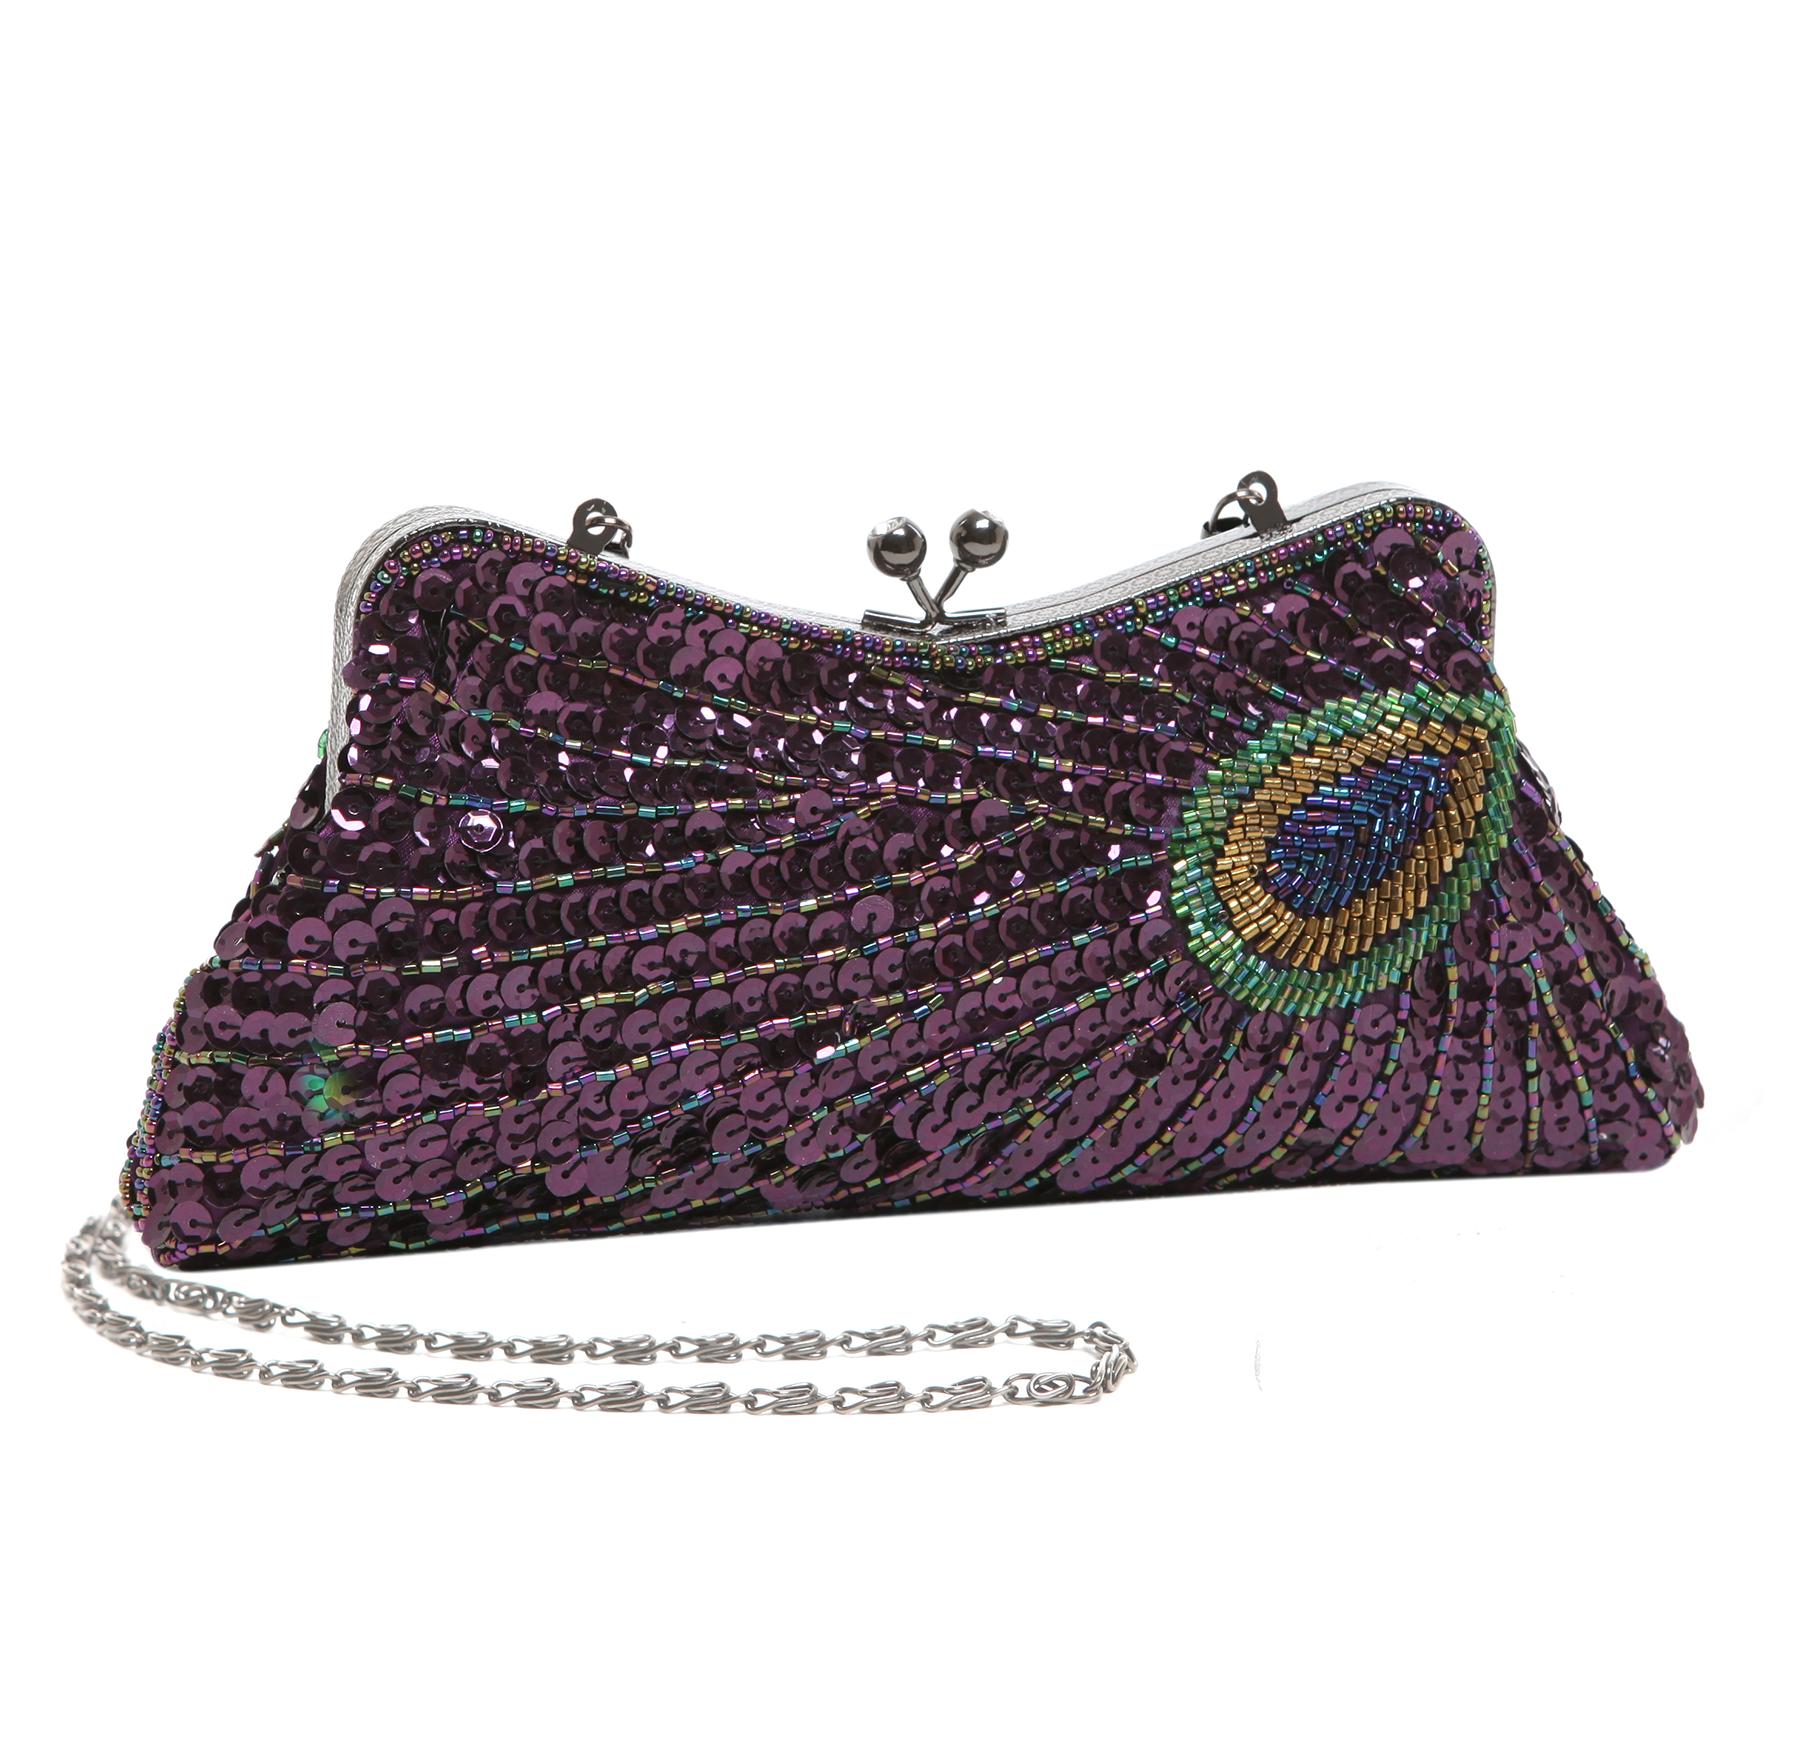 LAUREL Purple Sequined Evening Bag main